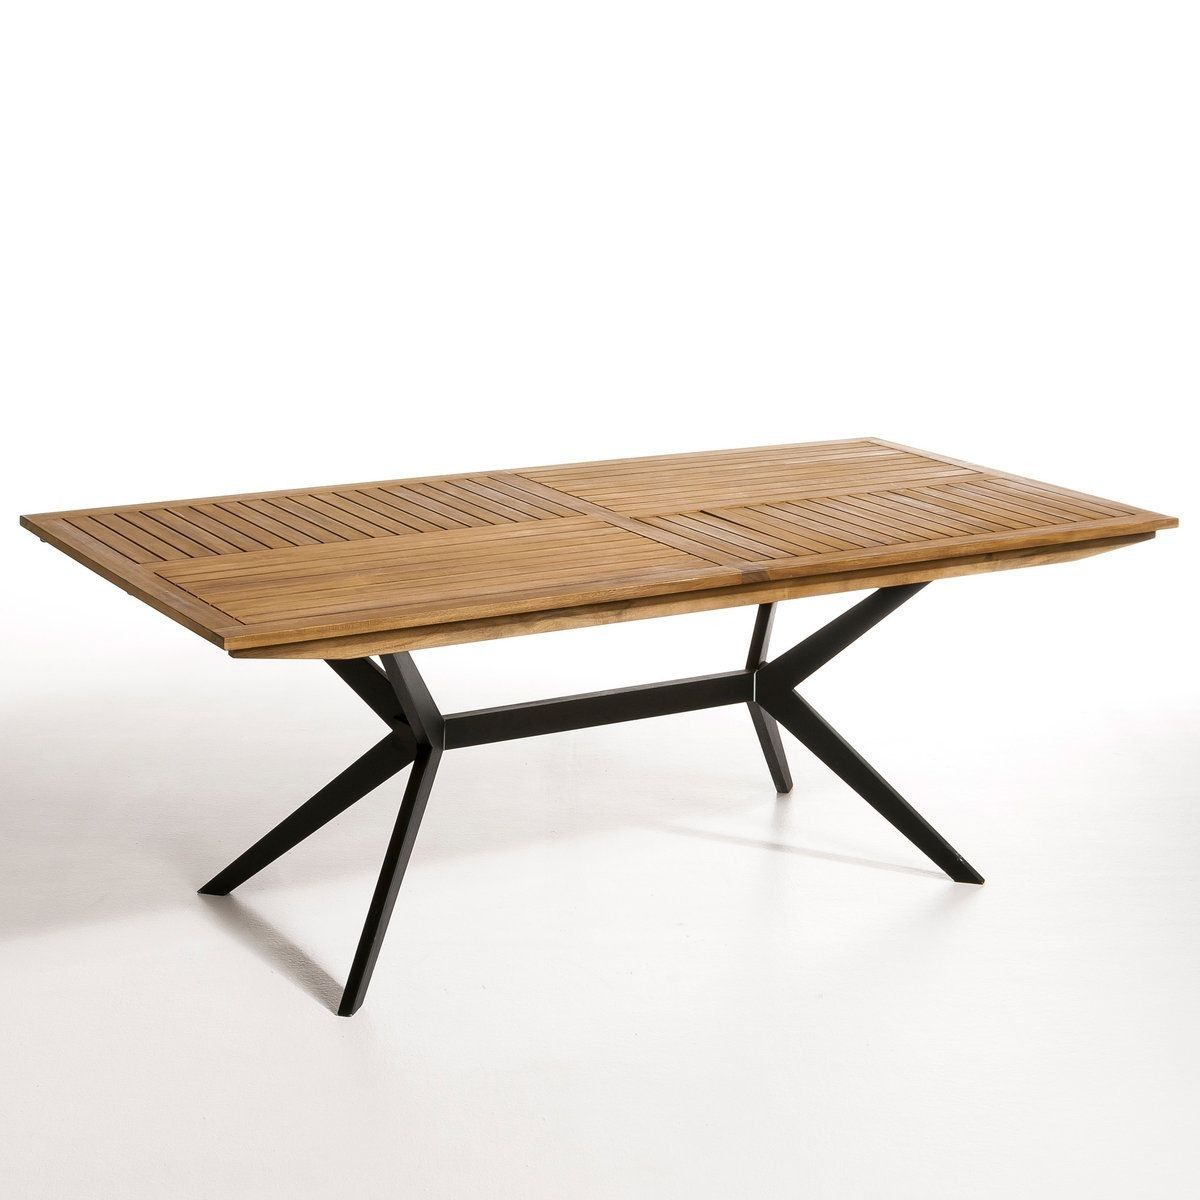 Table de jardin rectangulaire, Jakta   mobilier jardin en ...